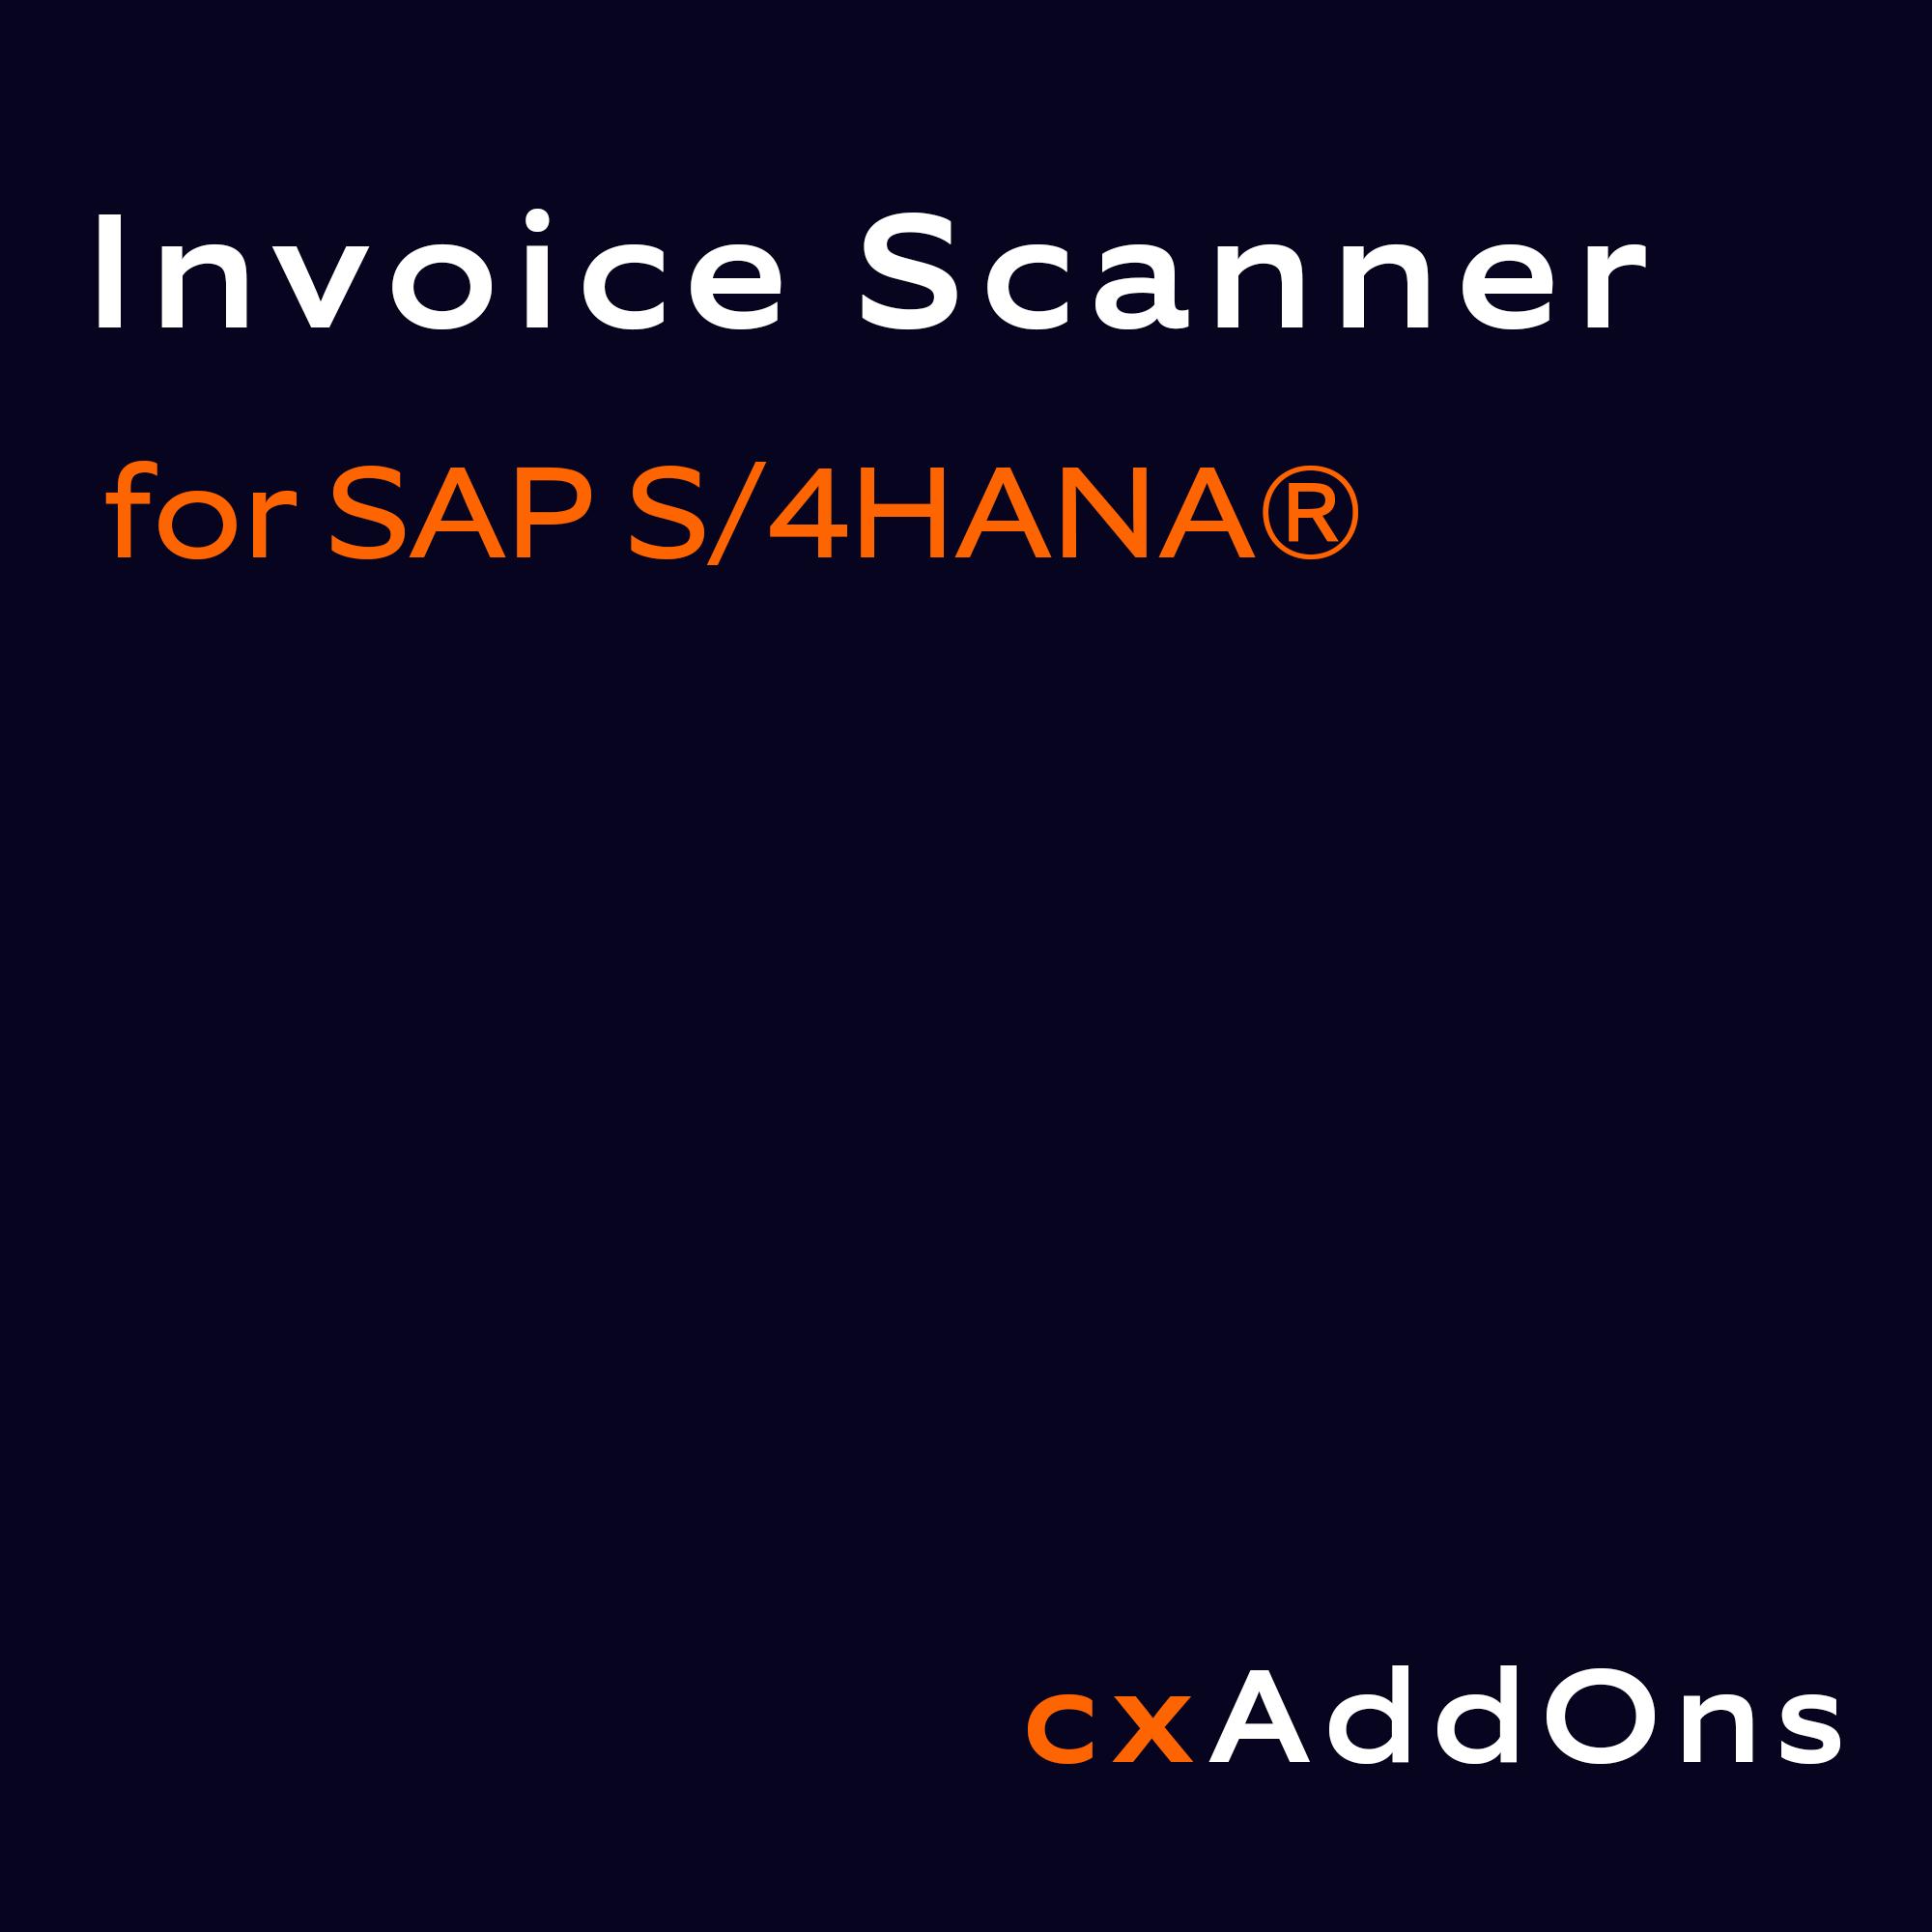 Nagarro ES Invoice Scanner for SAP S/4HANA